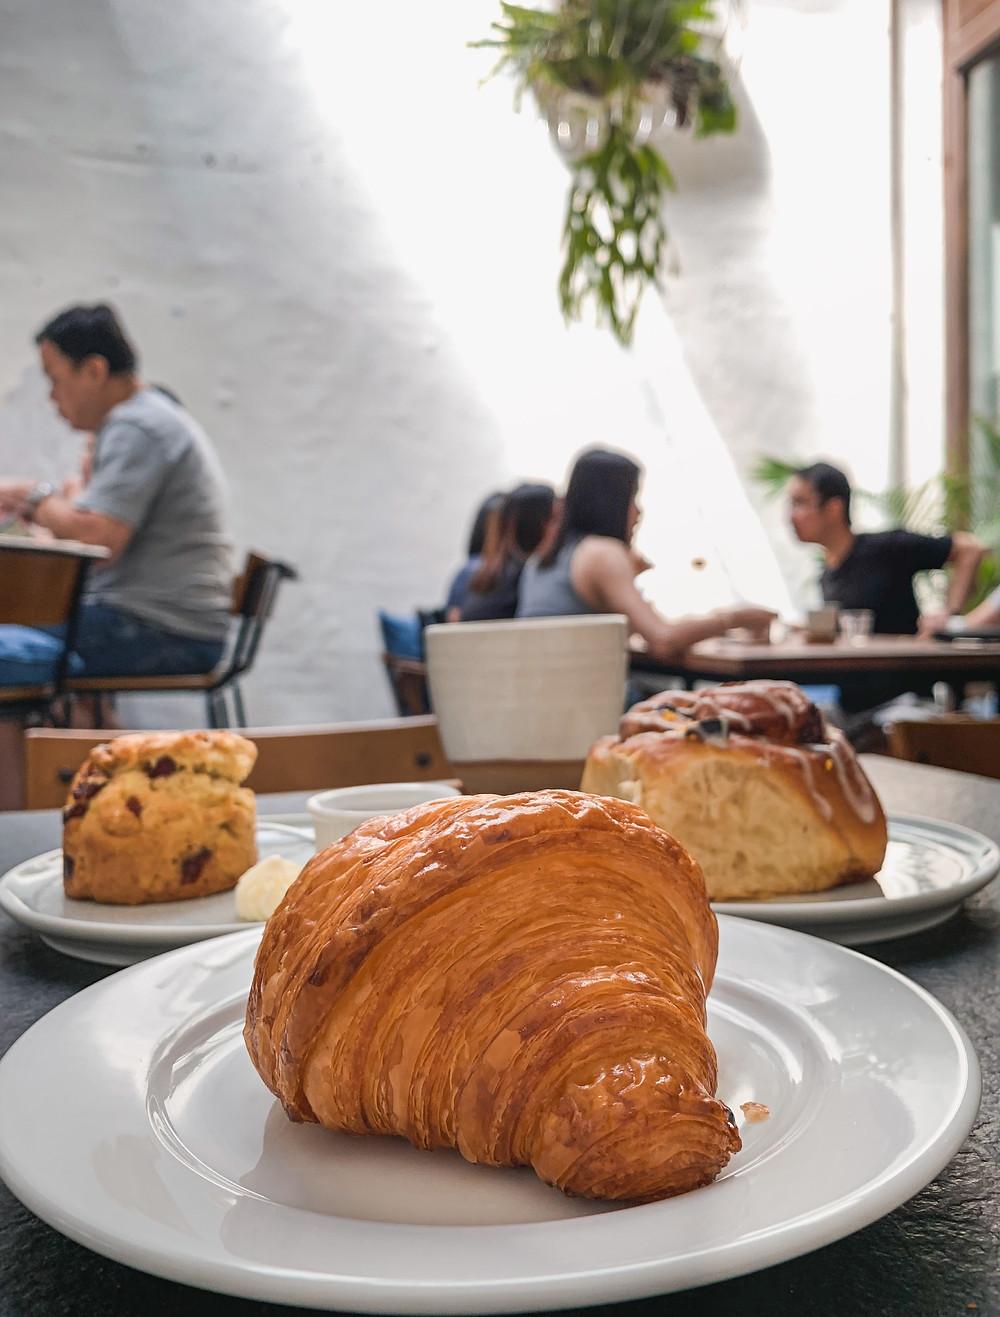 Le Petit Four Patisserie croissant, scone, cinnamon roll, RollingBear Travels food photography.